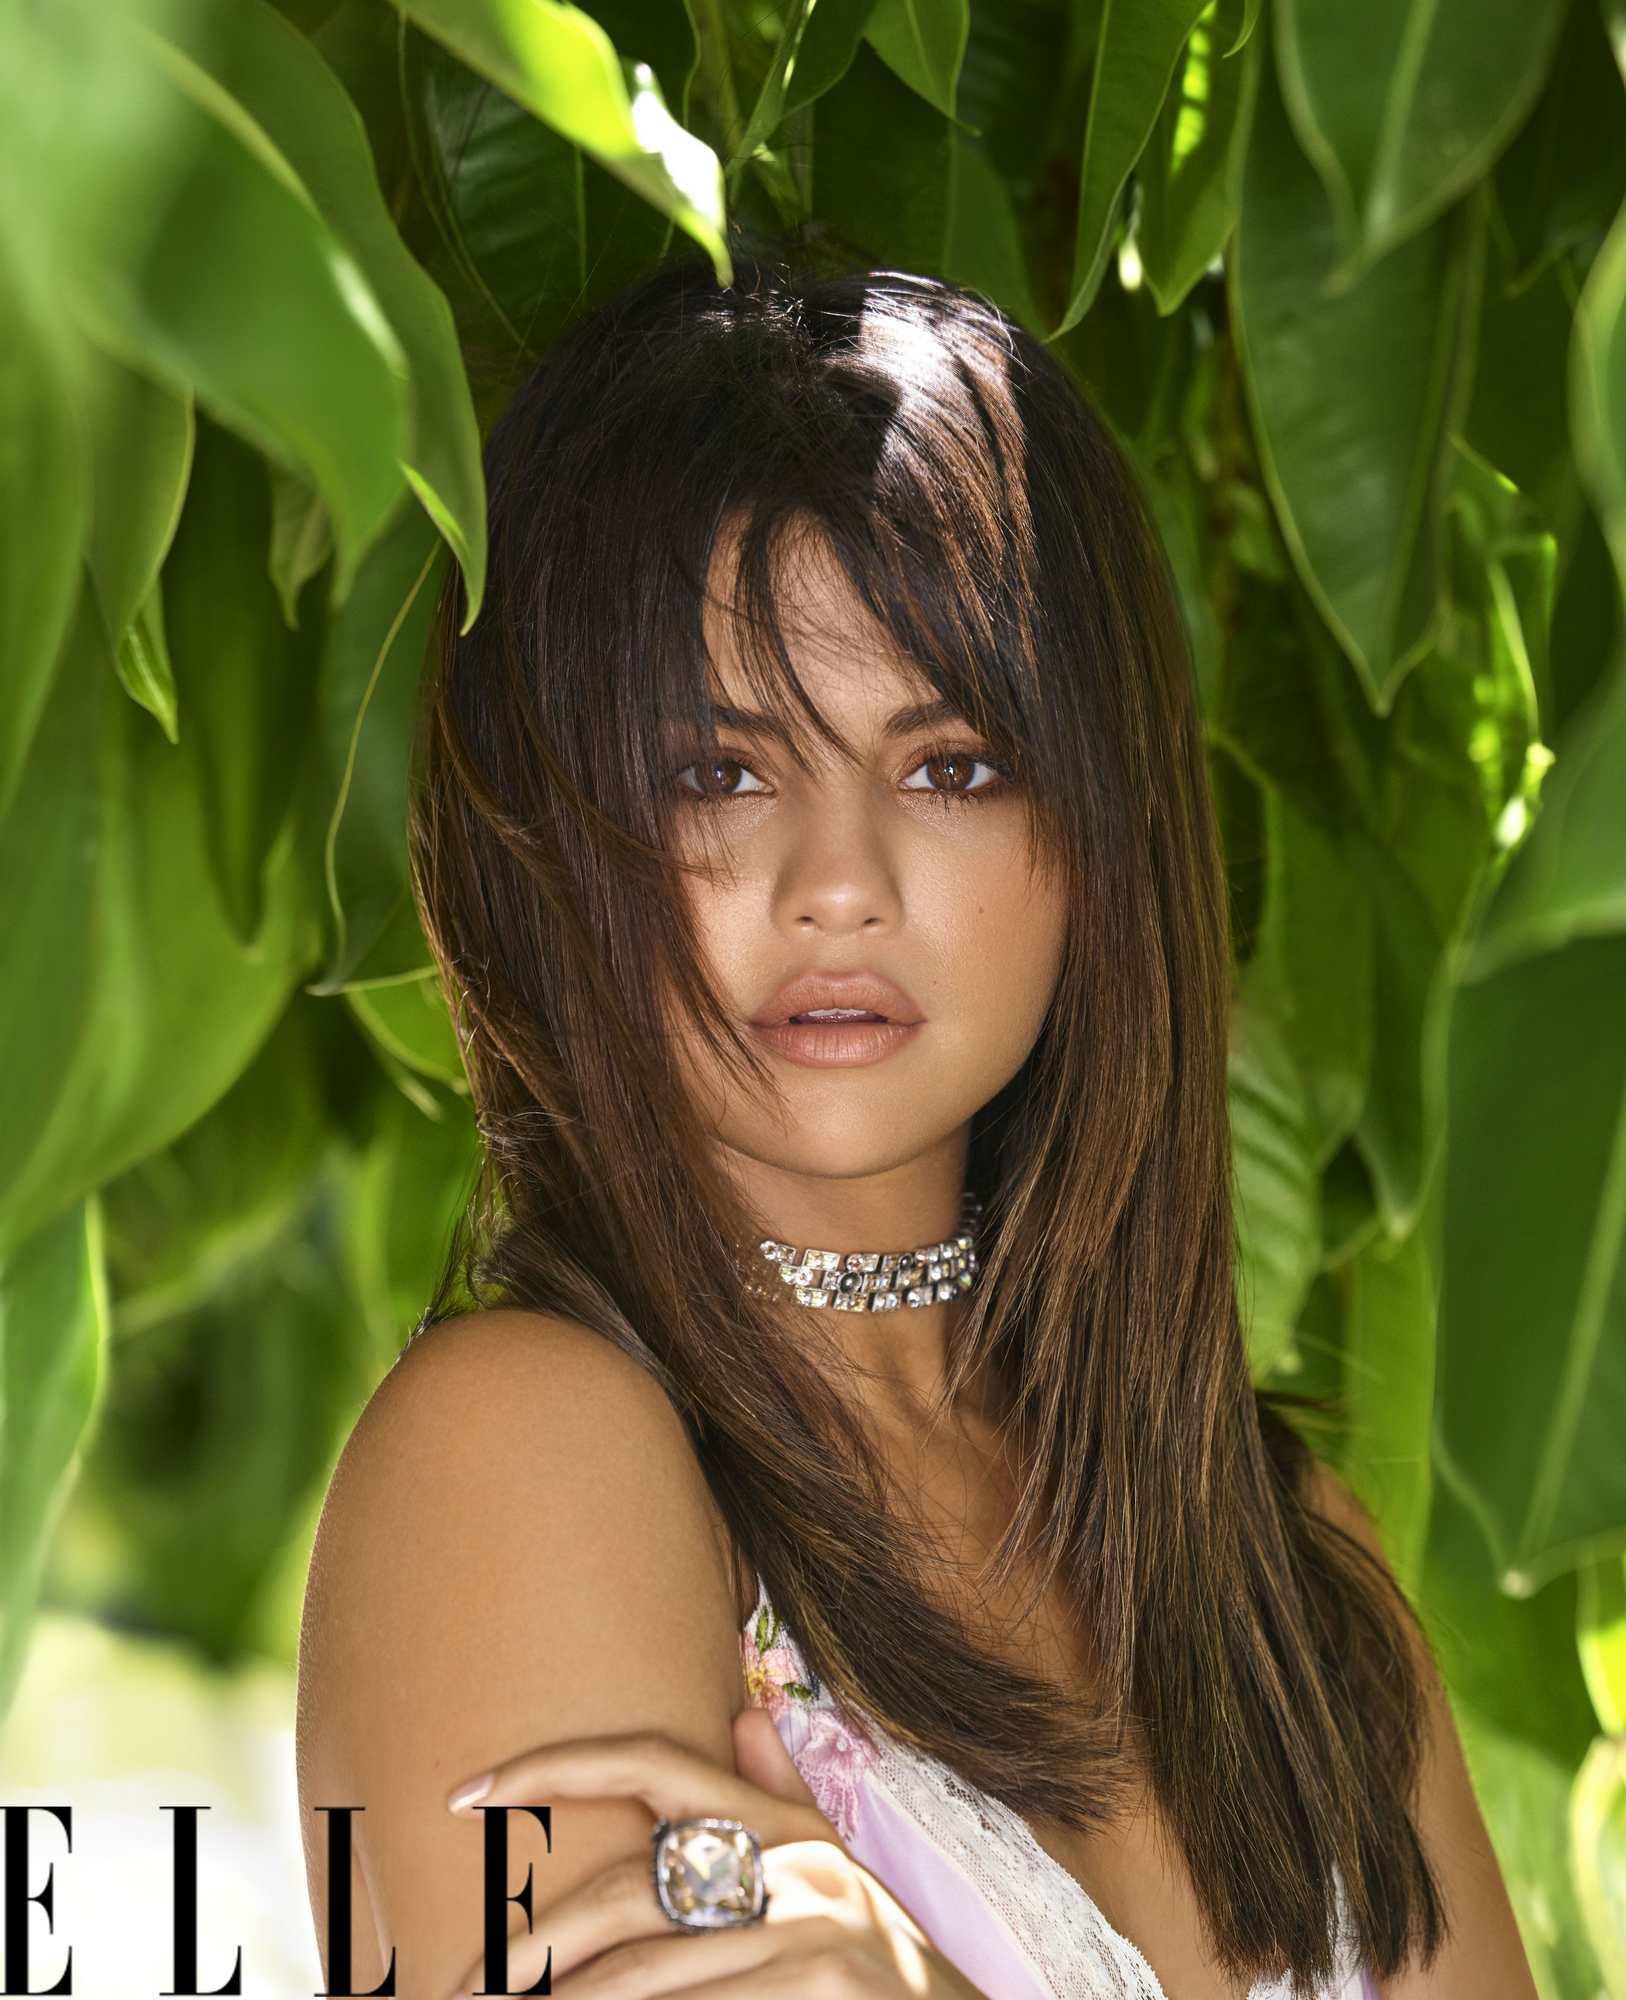 Selena-Gomez-ELLE-UK-By-Mariano-Vivanco-October-2018-IssueSelena-Gomez-ELLE-UK-By-Mariano-Viva.jpg